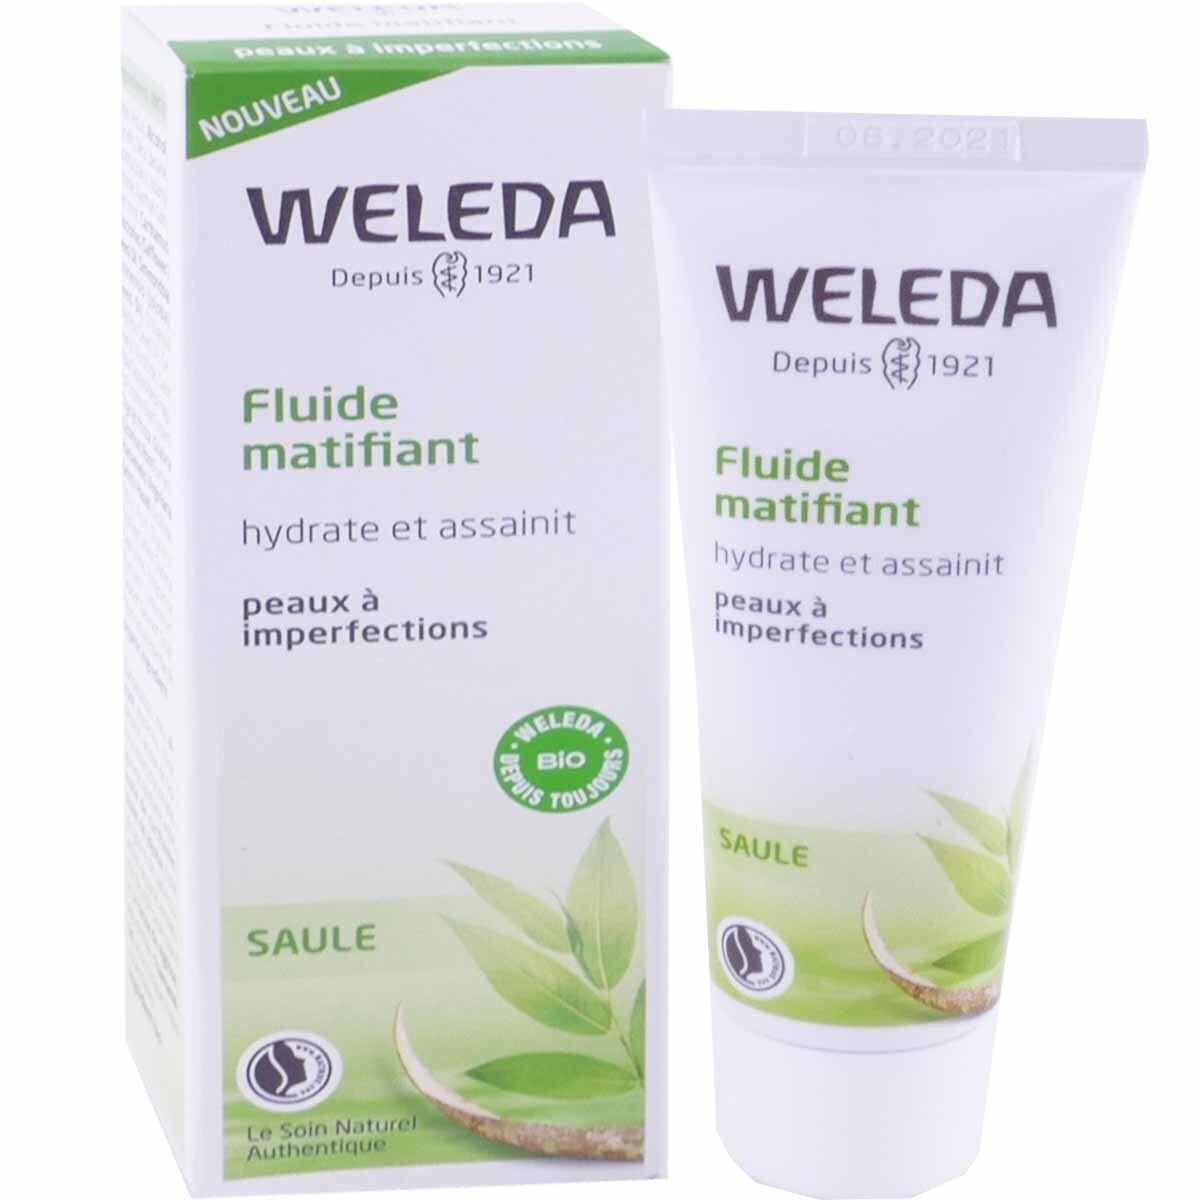 Weleda fluide matifiant saule 30 ml